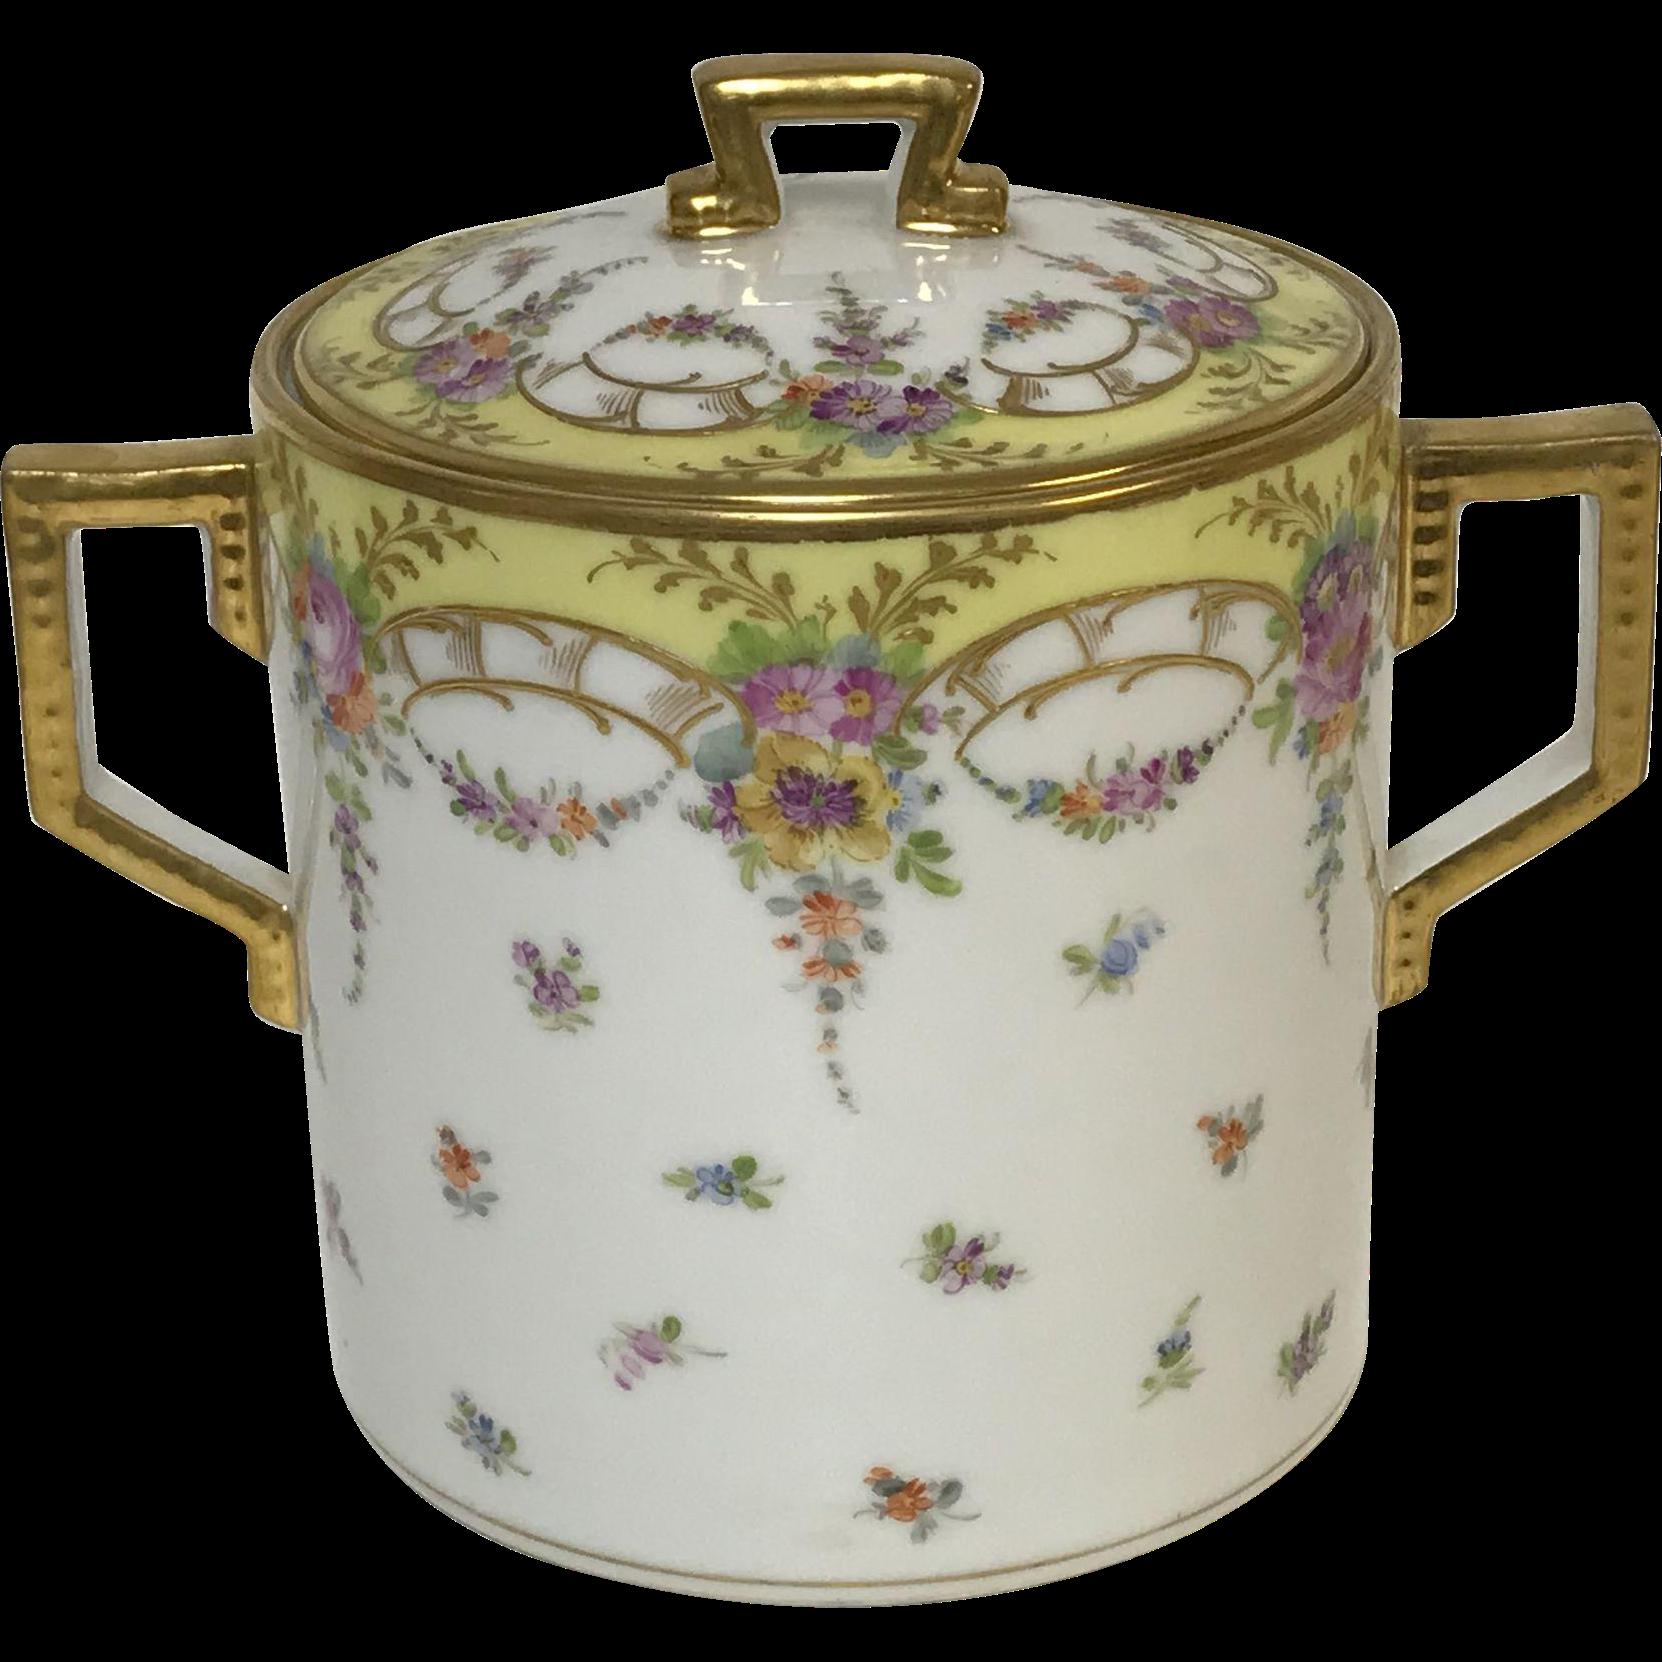 Richard Klemm Dresden Covered Cookie Jar With Gold & Flower Decoration